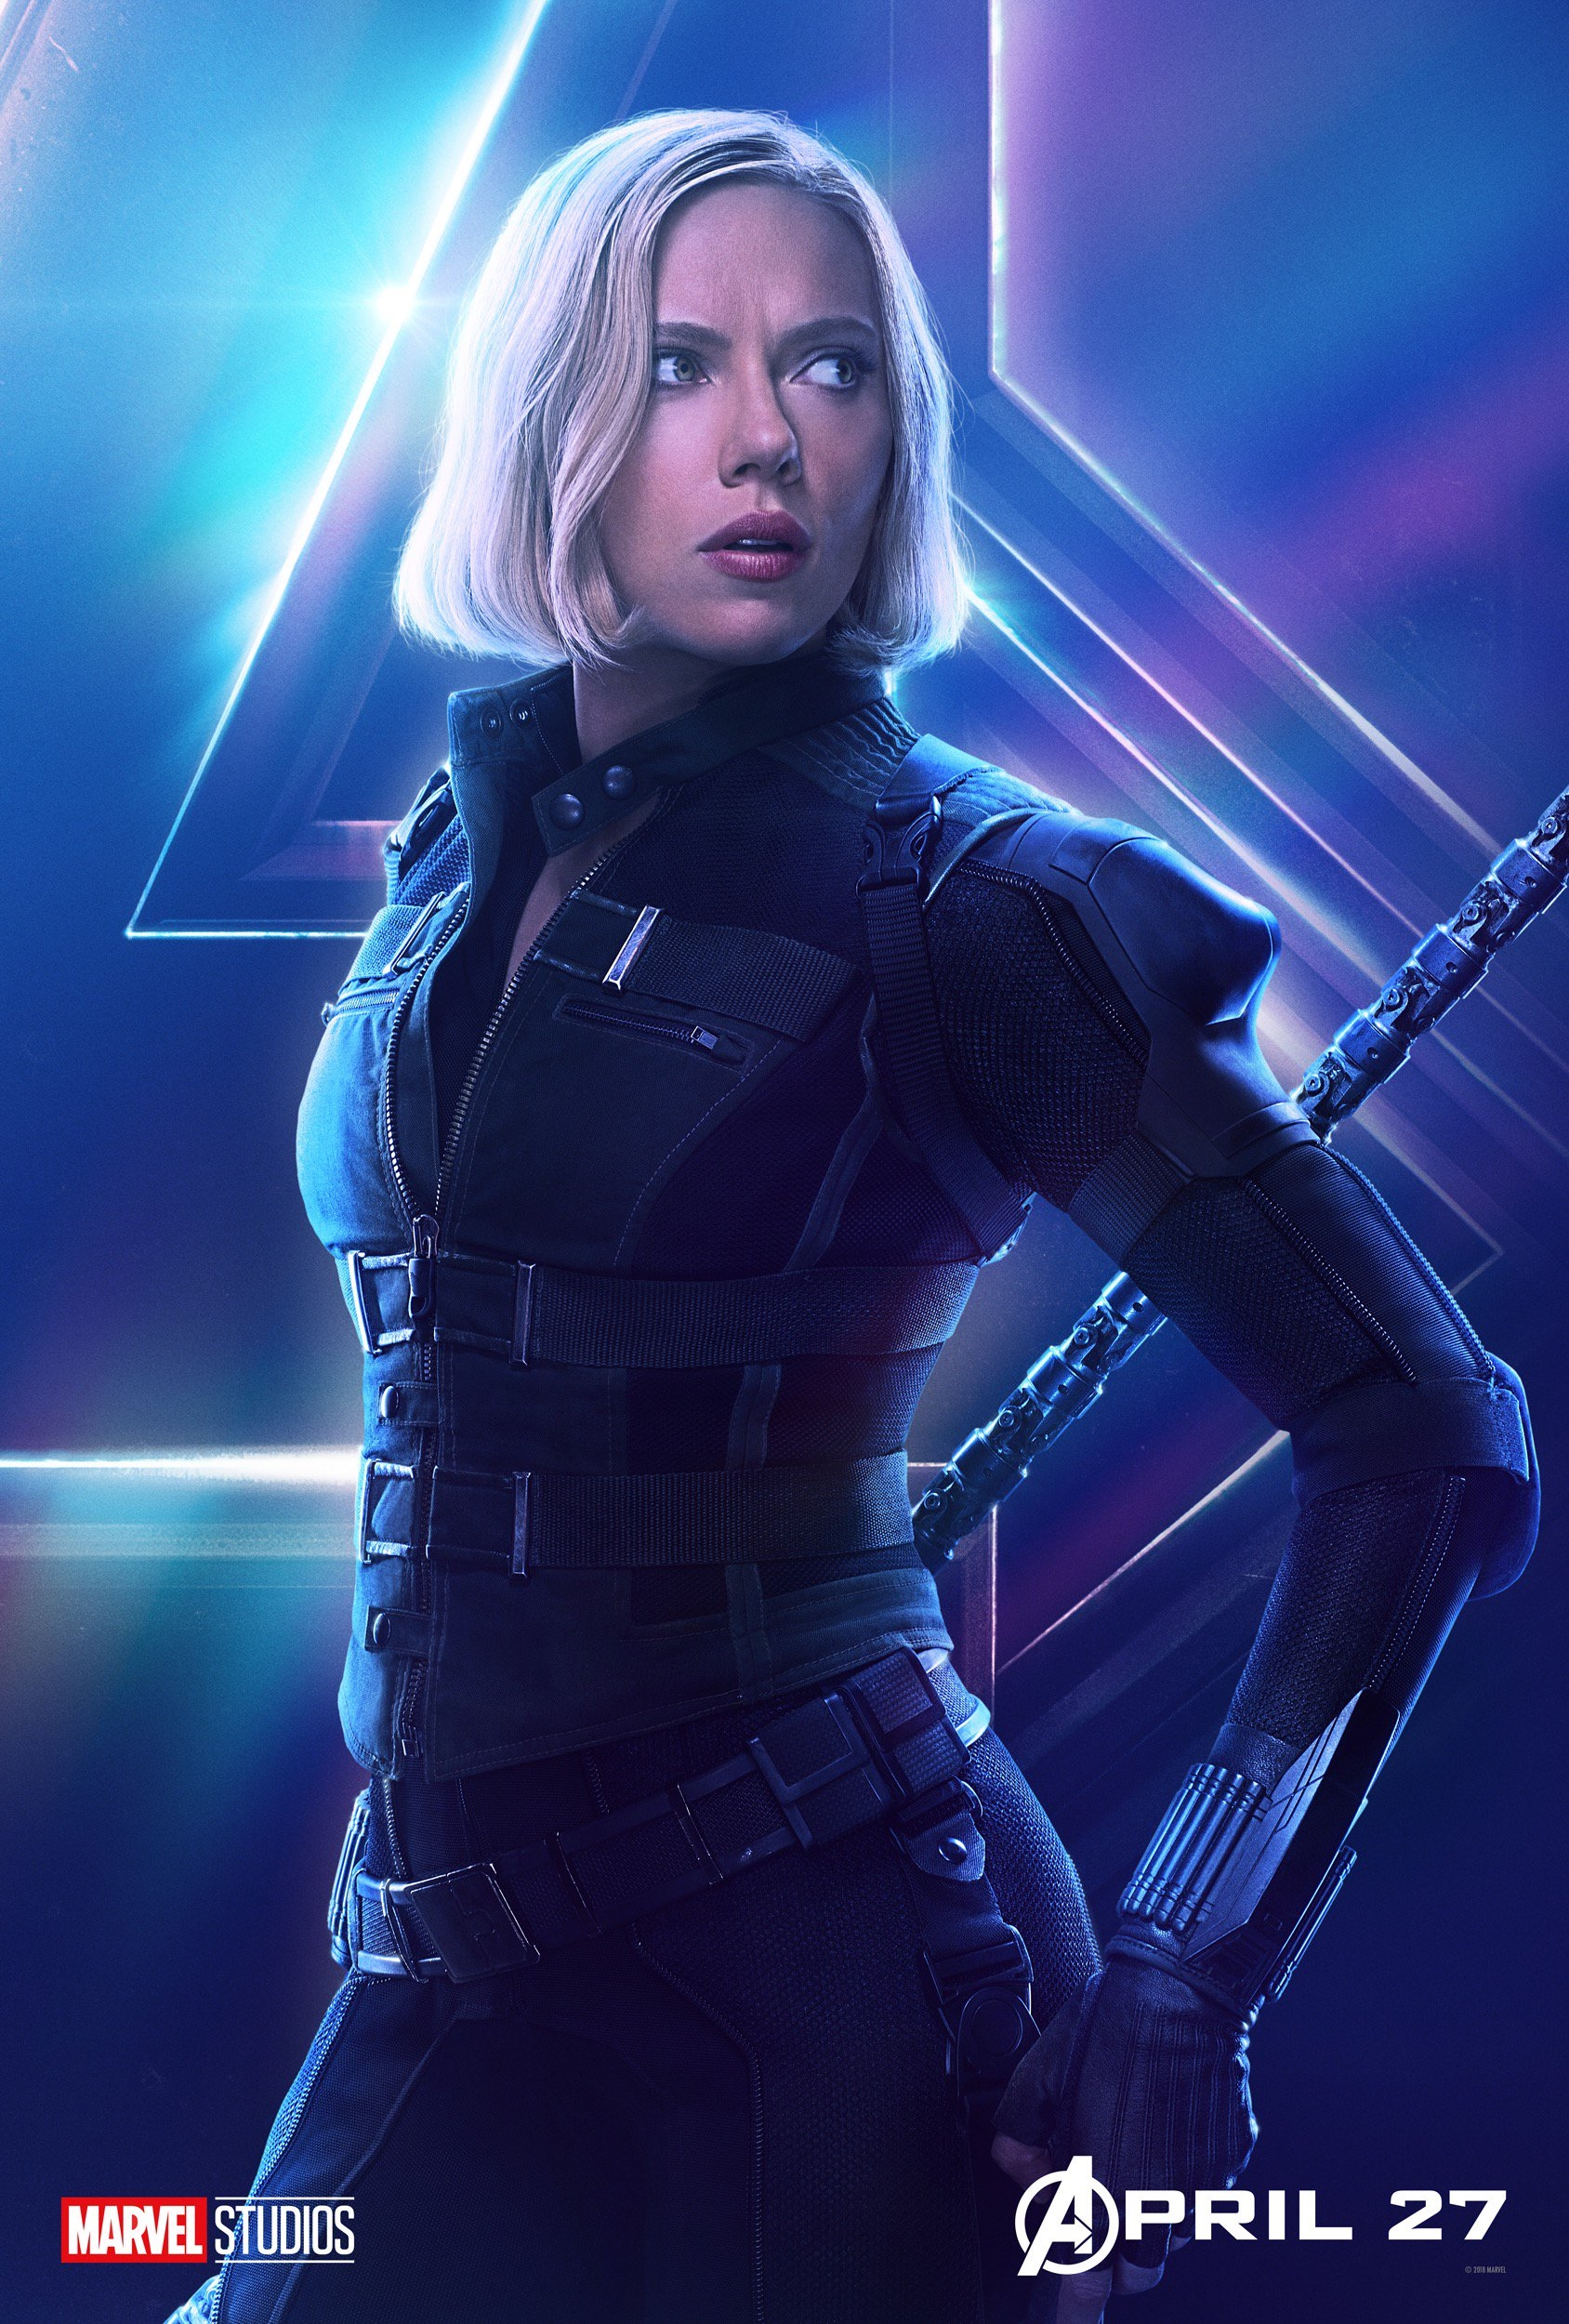 Natalia Romanoff Marvel Movies